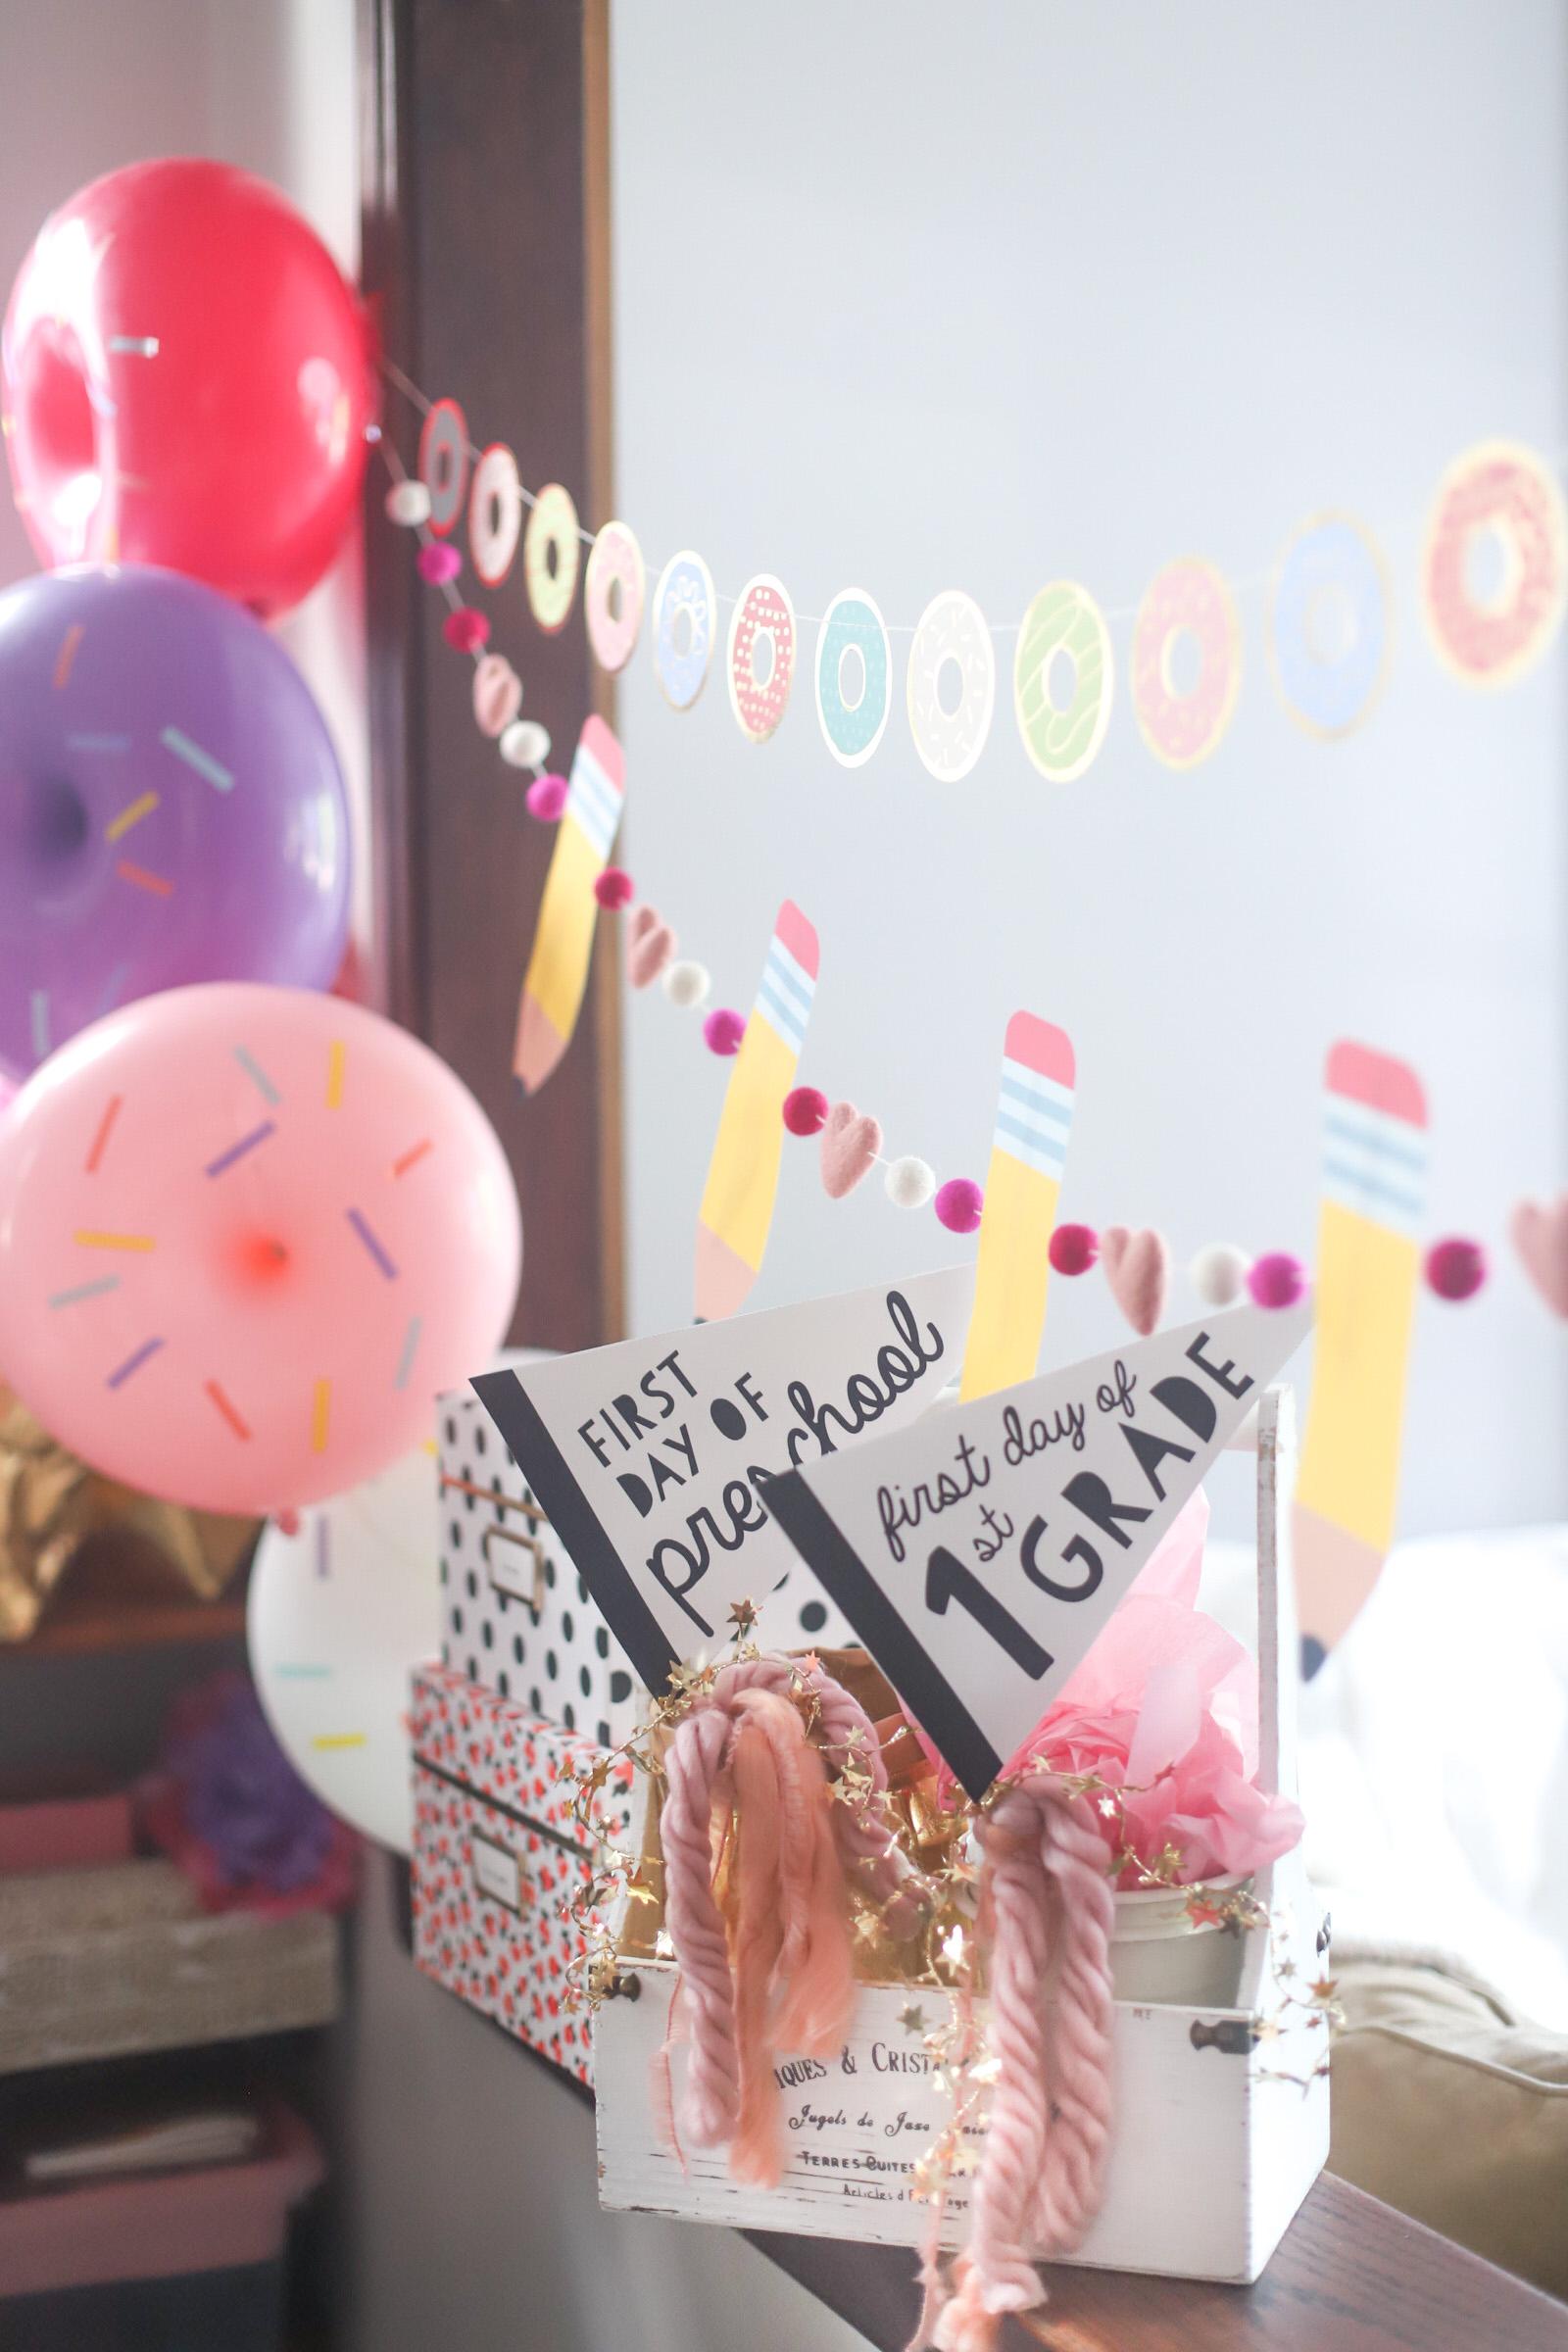 Back to School Donut Party // First Day // Celebration | @glitterinclexi | GLITTERINC.COM